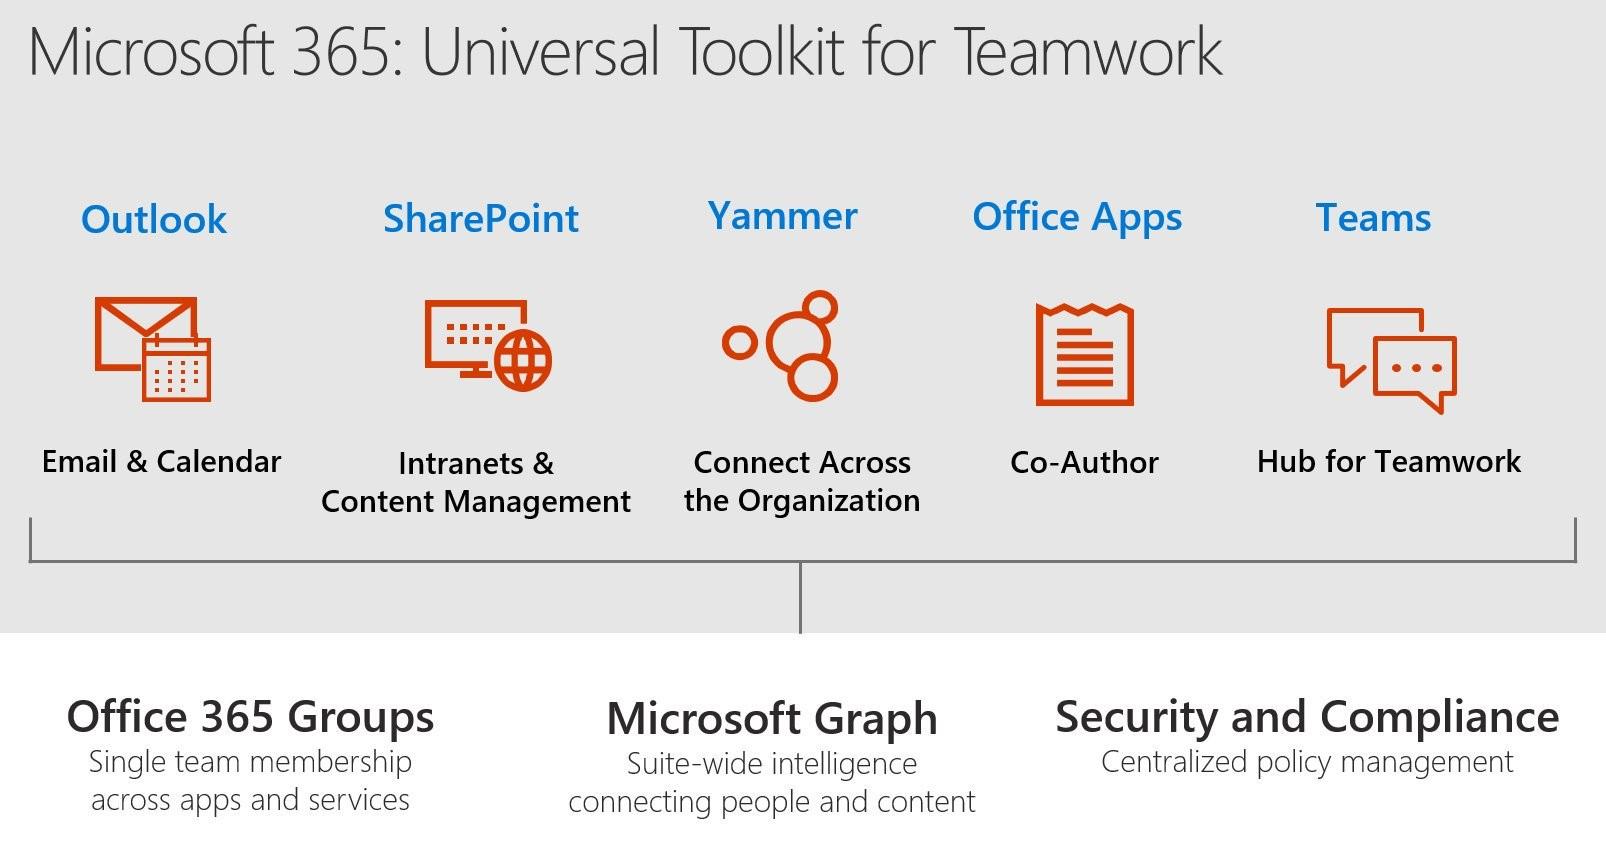 MIcrosoft 365 Universal Toolkit for Teamwork